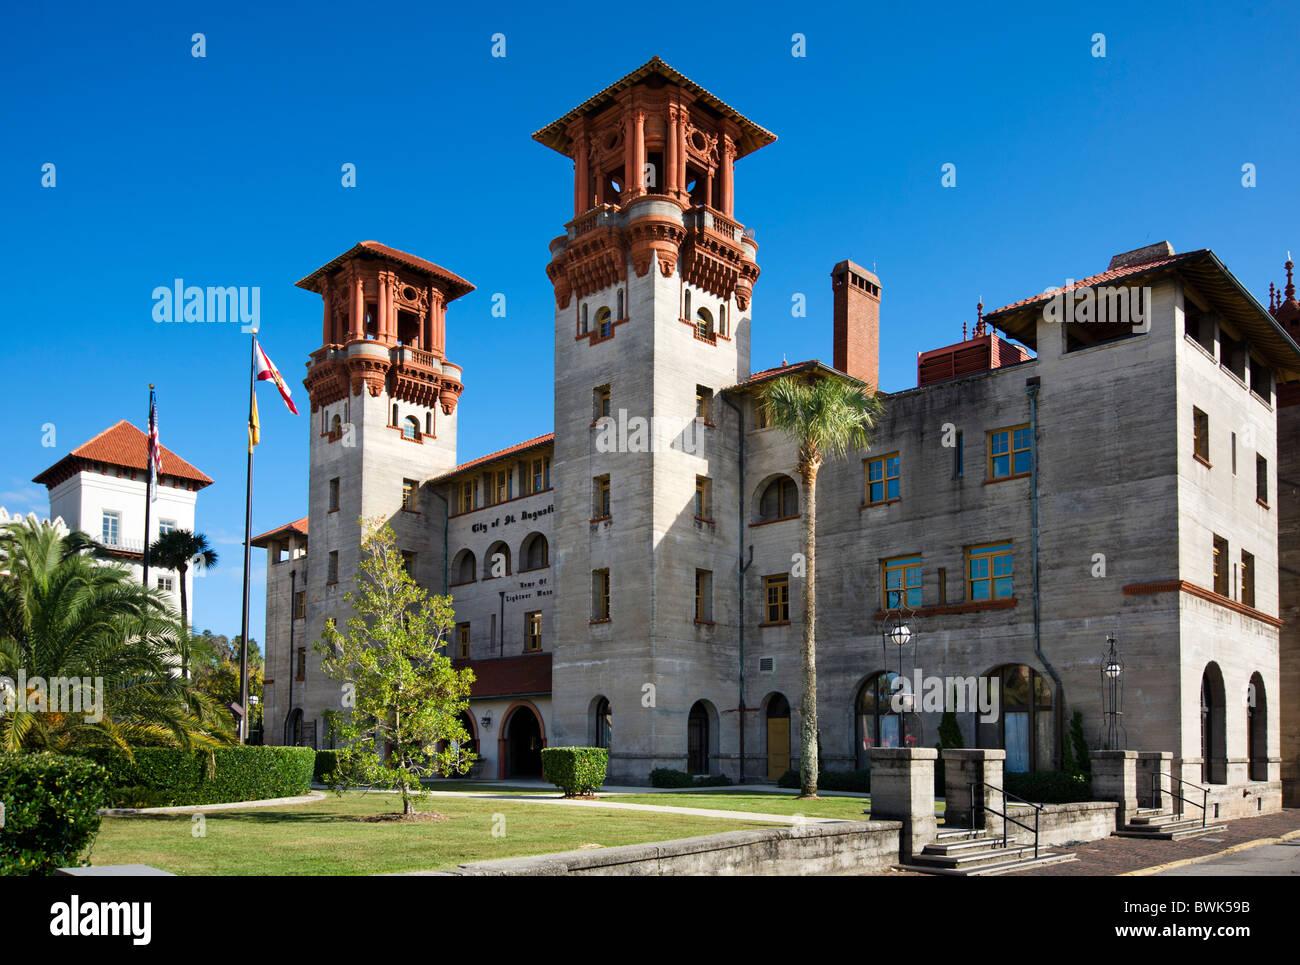 City Hall and Lightner Museum, King Street, St Augustine, Florida, USA - Stock Image